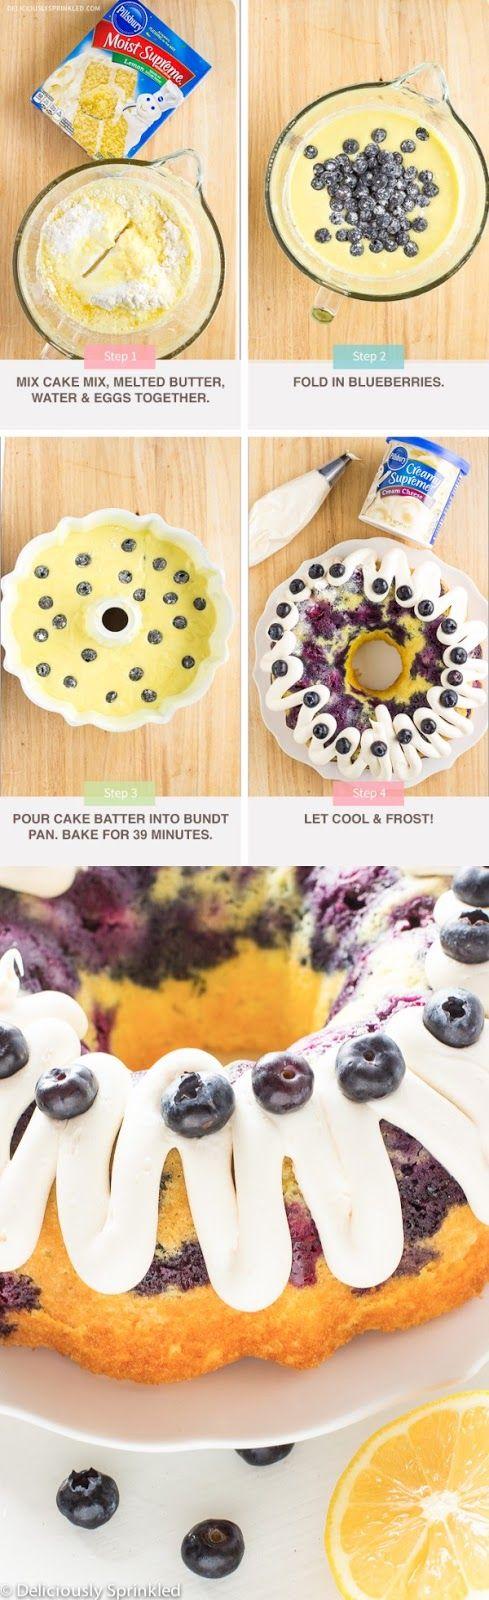 Lemon Blueberry Bundt Cake Recipe   Ingredients     1 box Pillsbury™ Moist Supreme® Lemon Premium Cake Mix  1/2 (1 stick) cup melted butt...